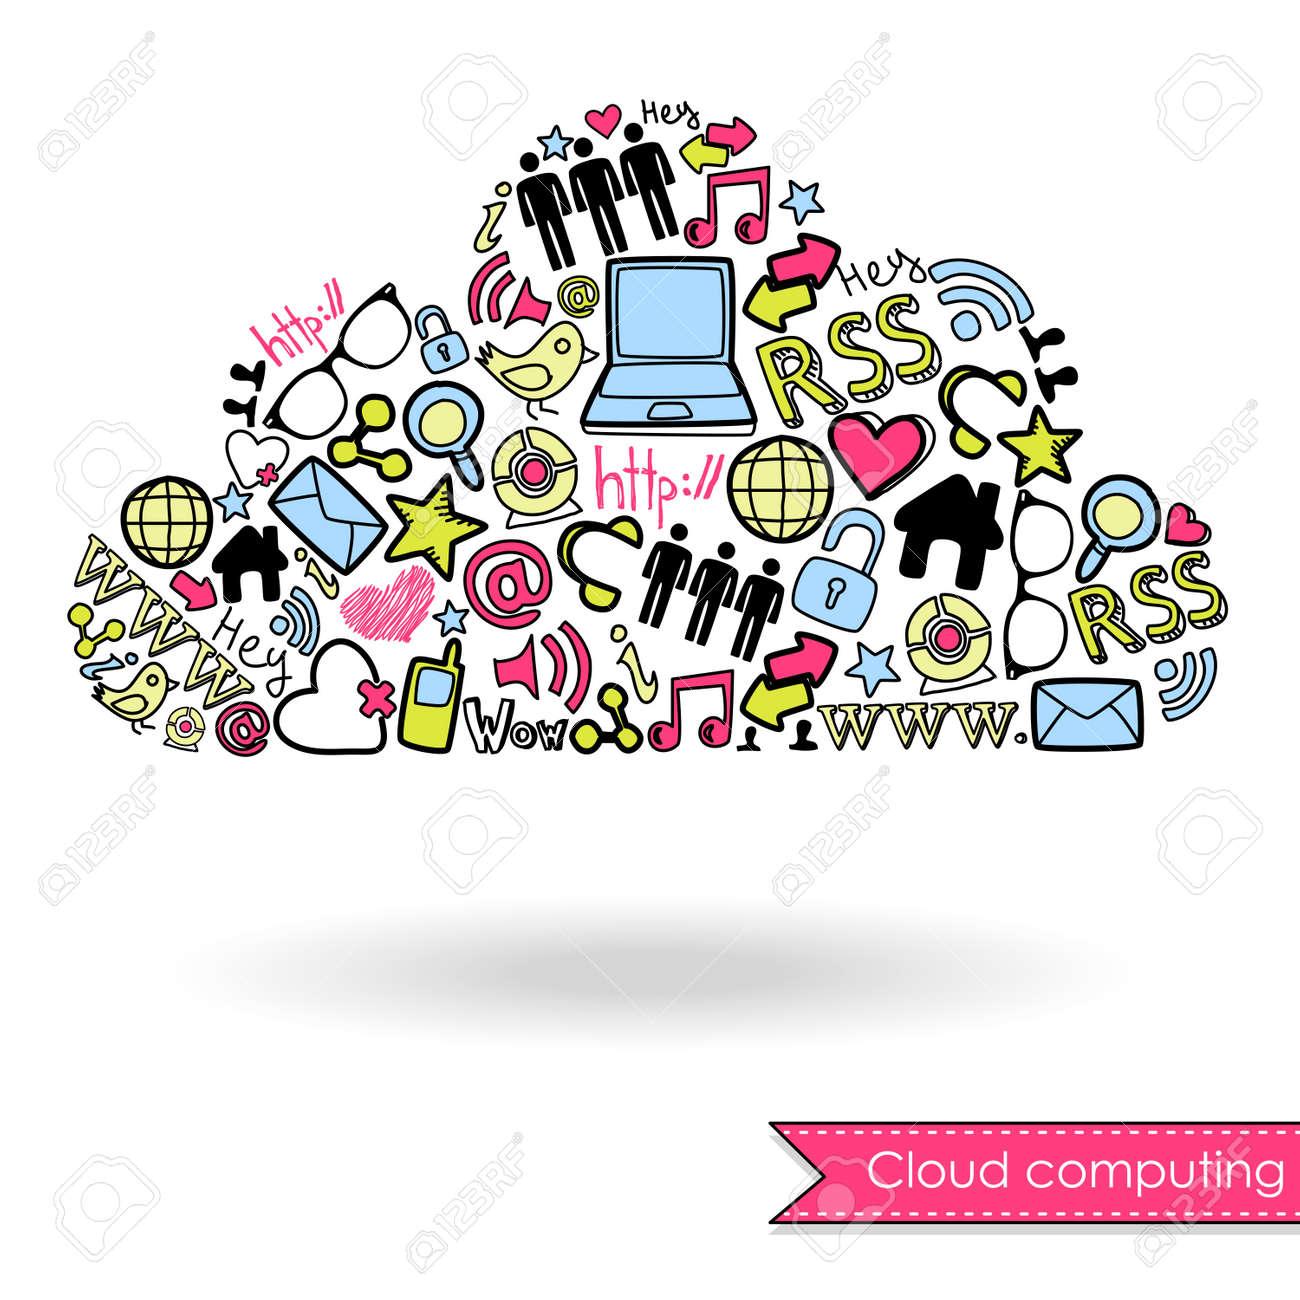 Cloud computing and social media concept. Cute Hand drawn doodles Stock Vector - 13339822